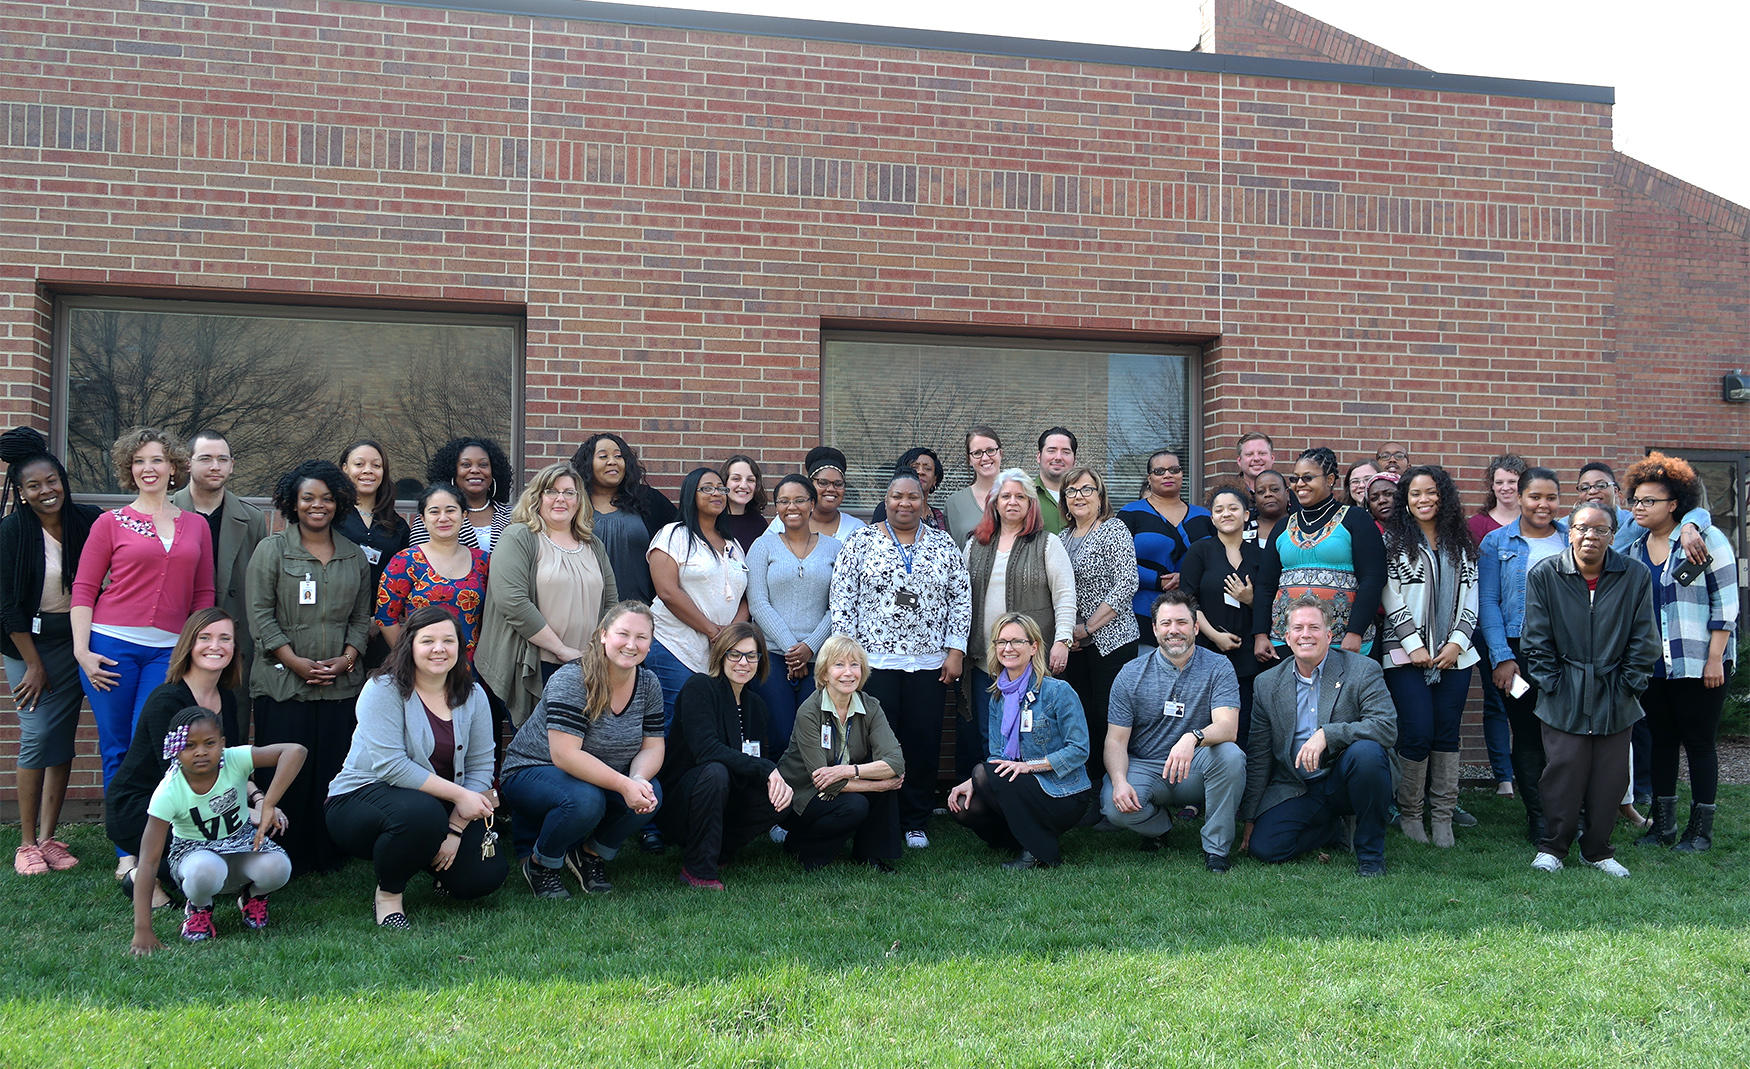 Group photo of Behavioral Health Staff